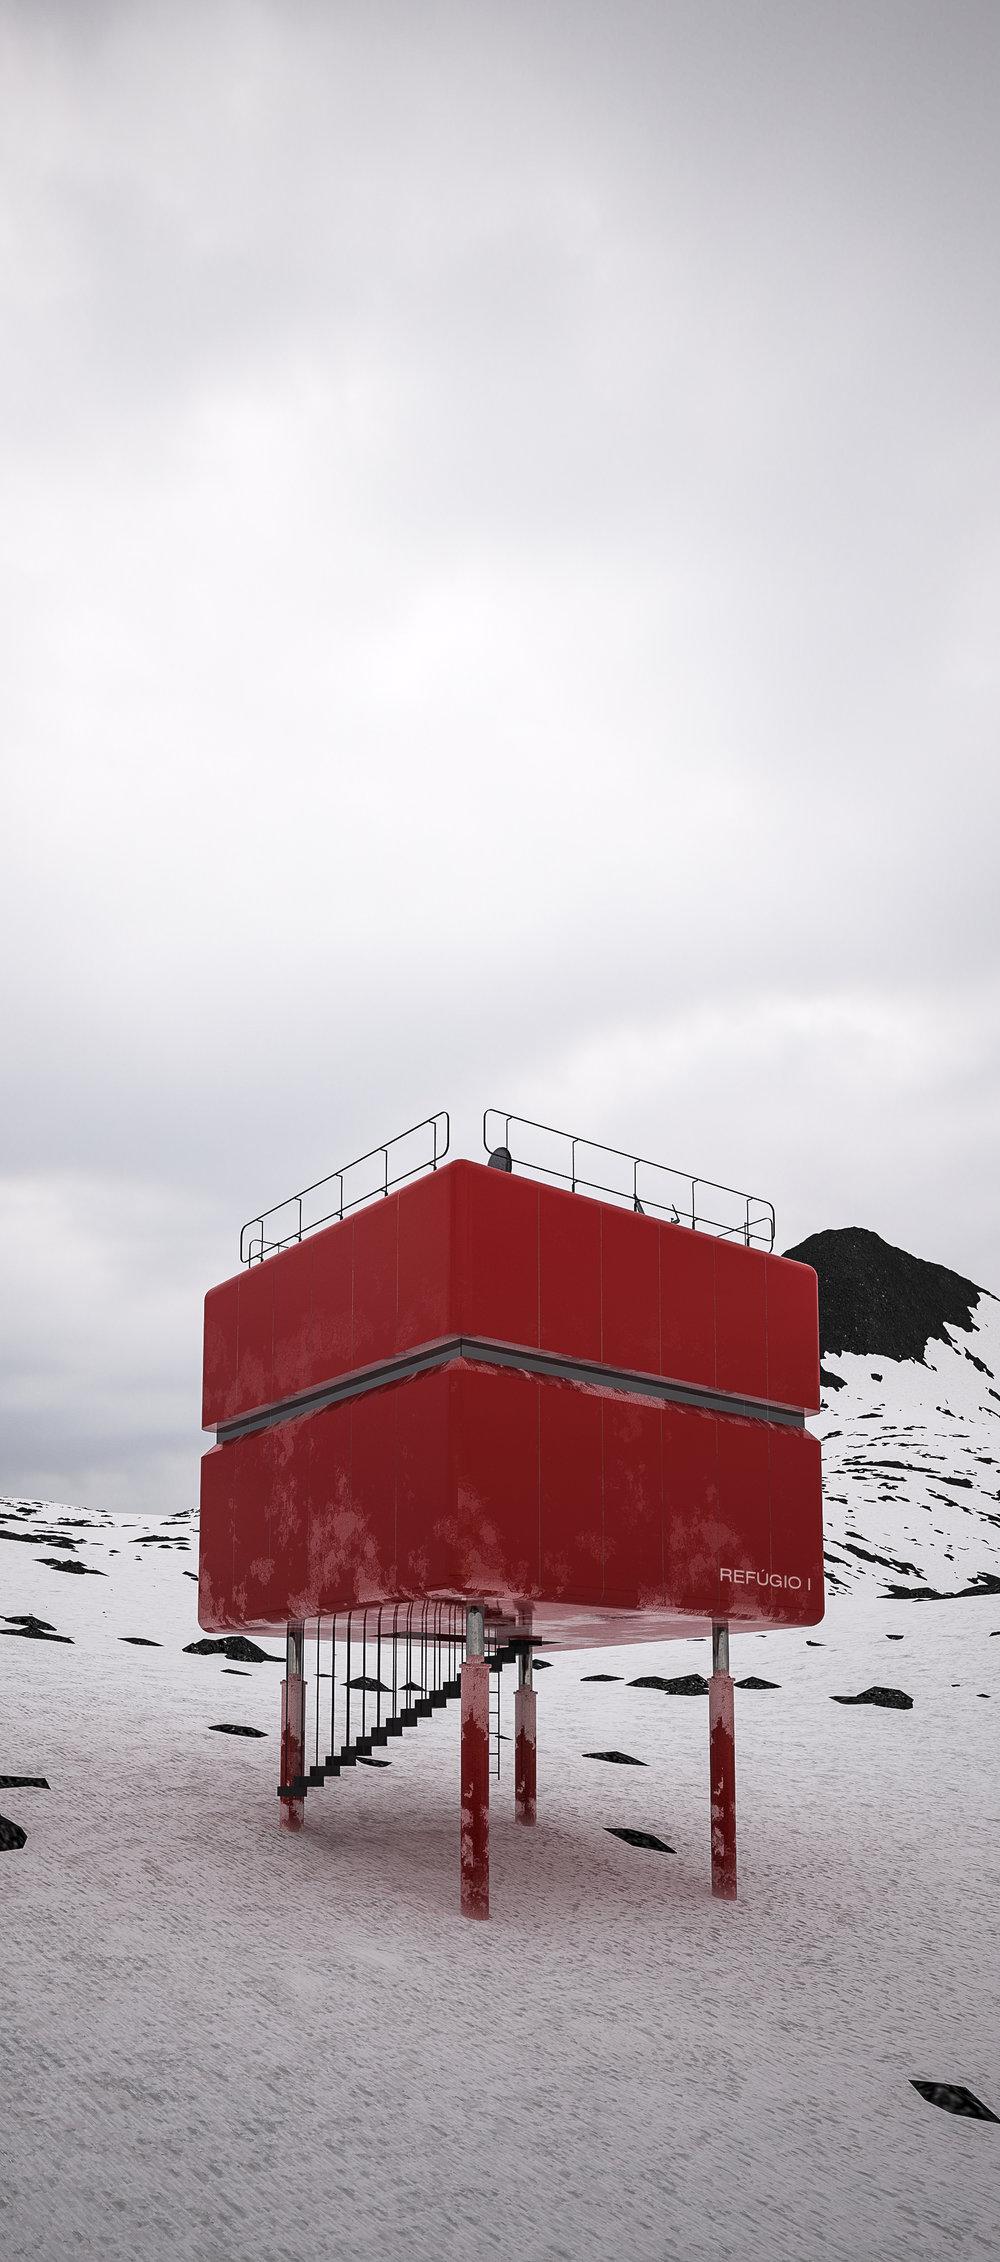 Comandante Ferraz  Brazilian Research Base , Keller Peninsula, Antarctica   learn more →